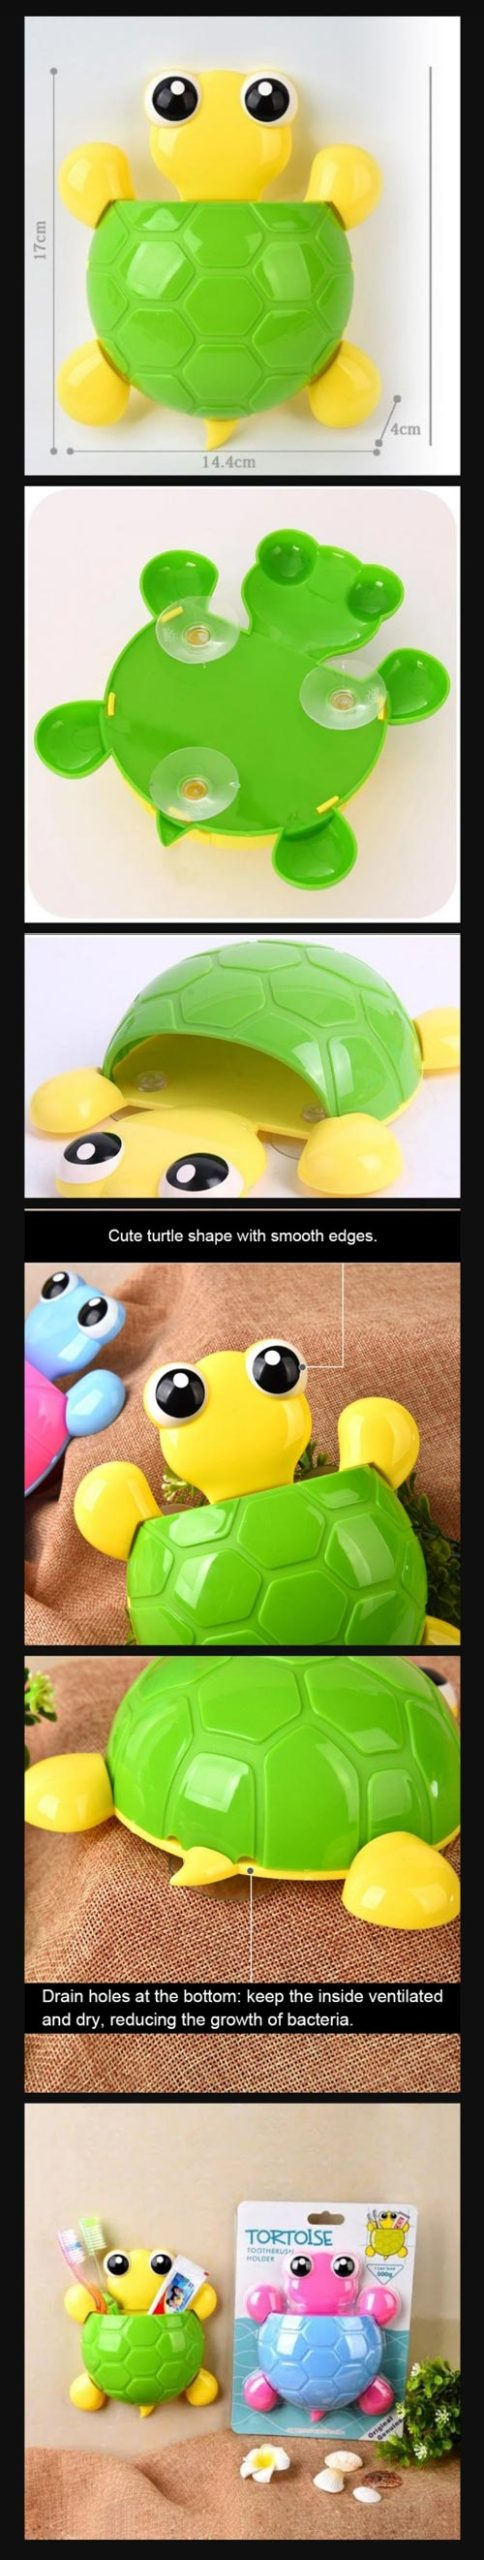 Turtle Toothbrush Holder